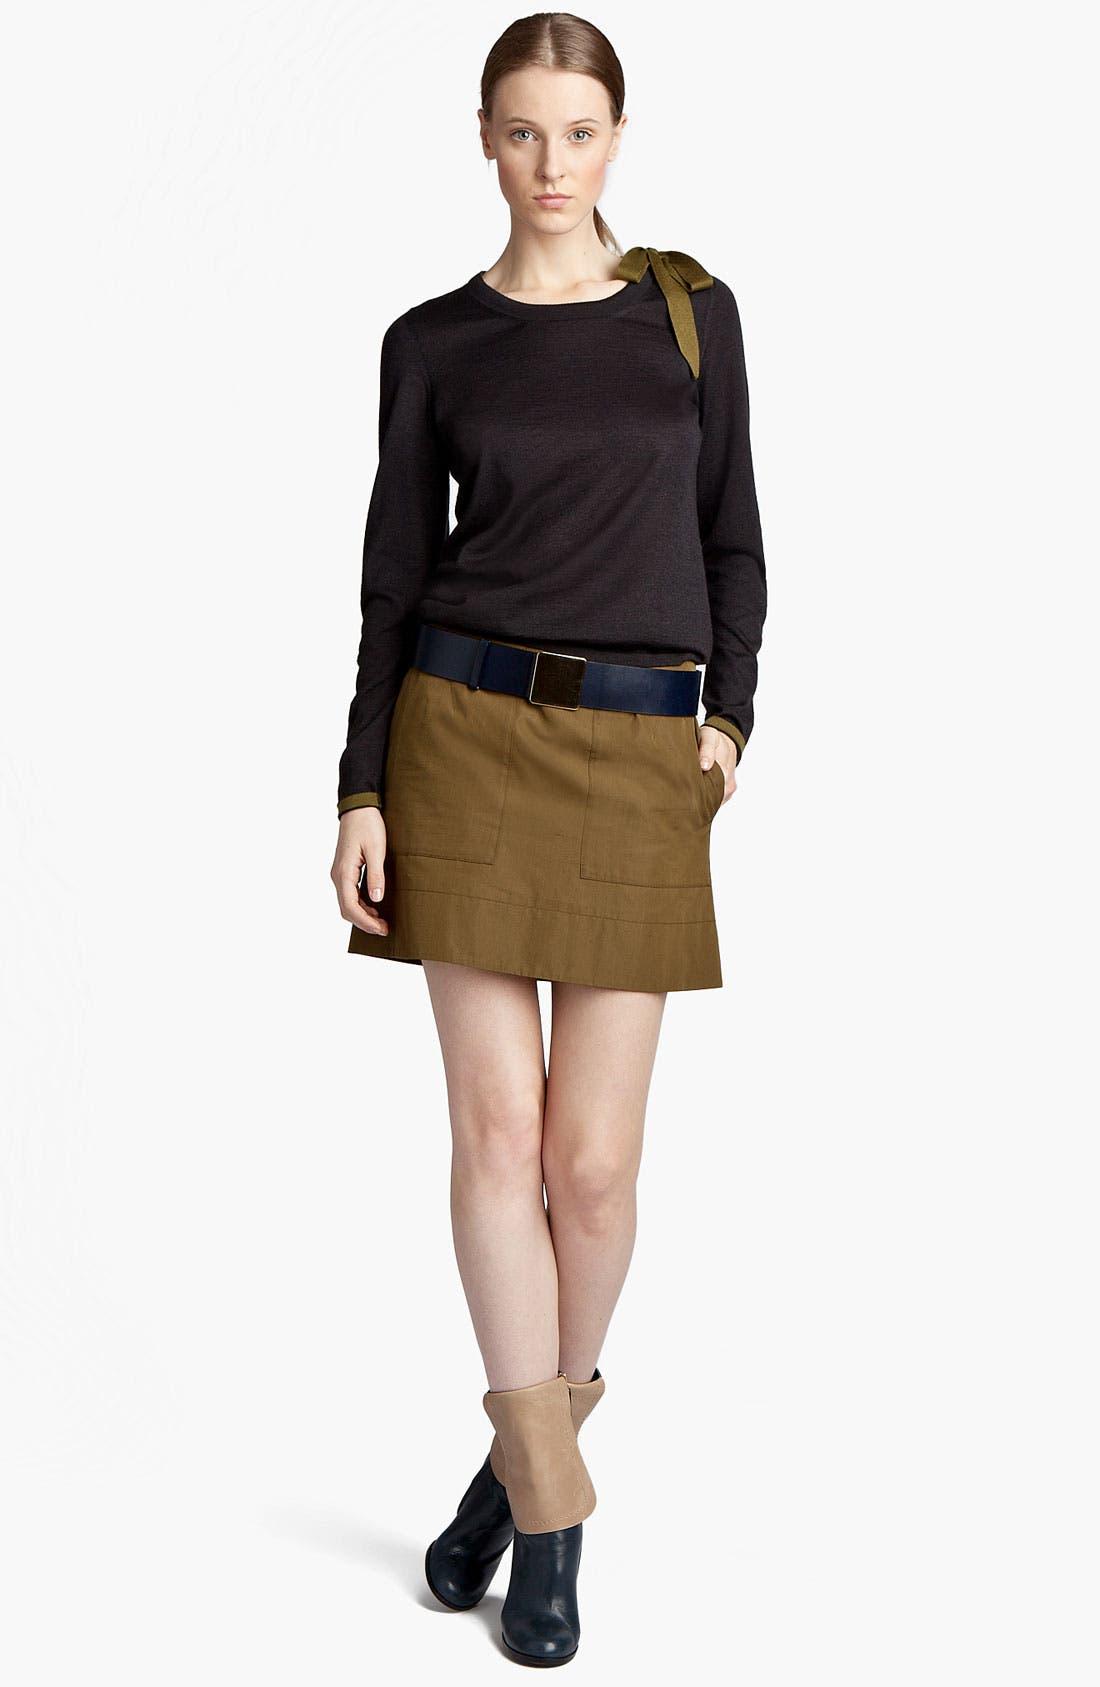 Main Image - Jil Sander Bow Detail Cashmere & Silk Sweater